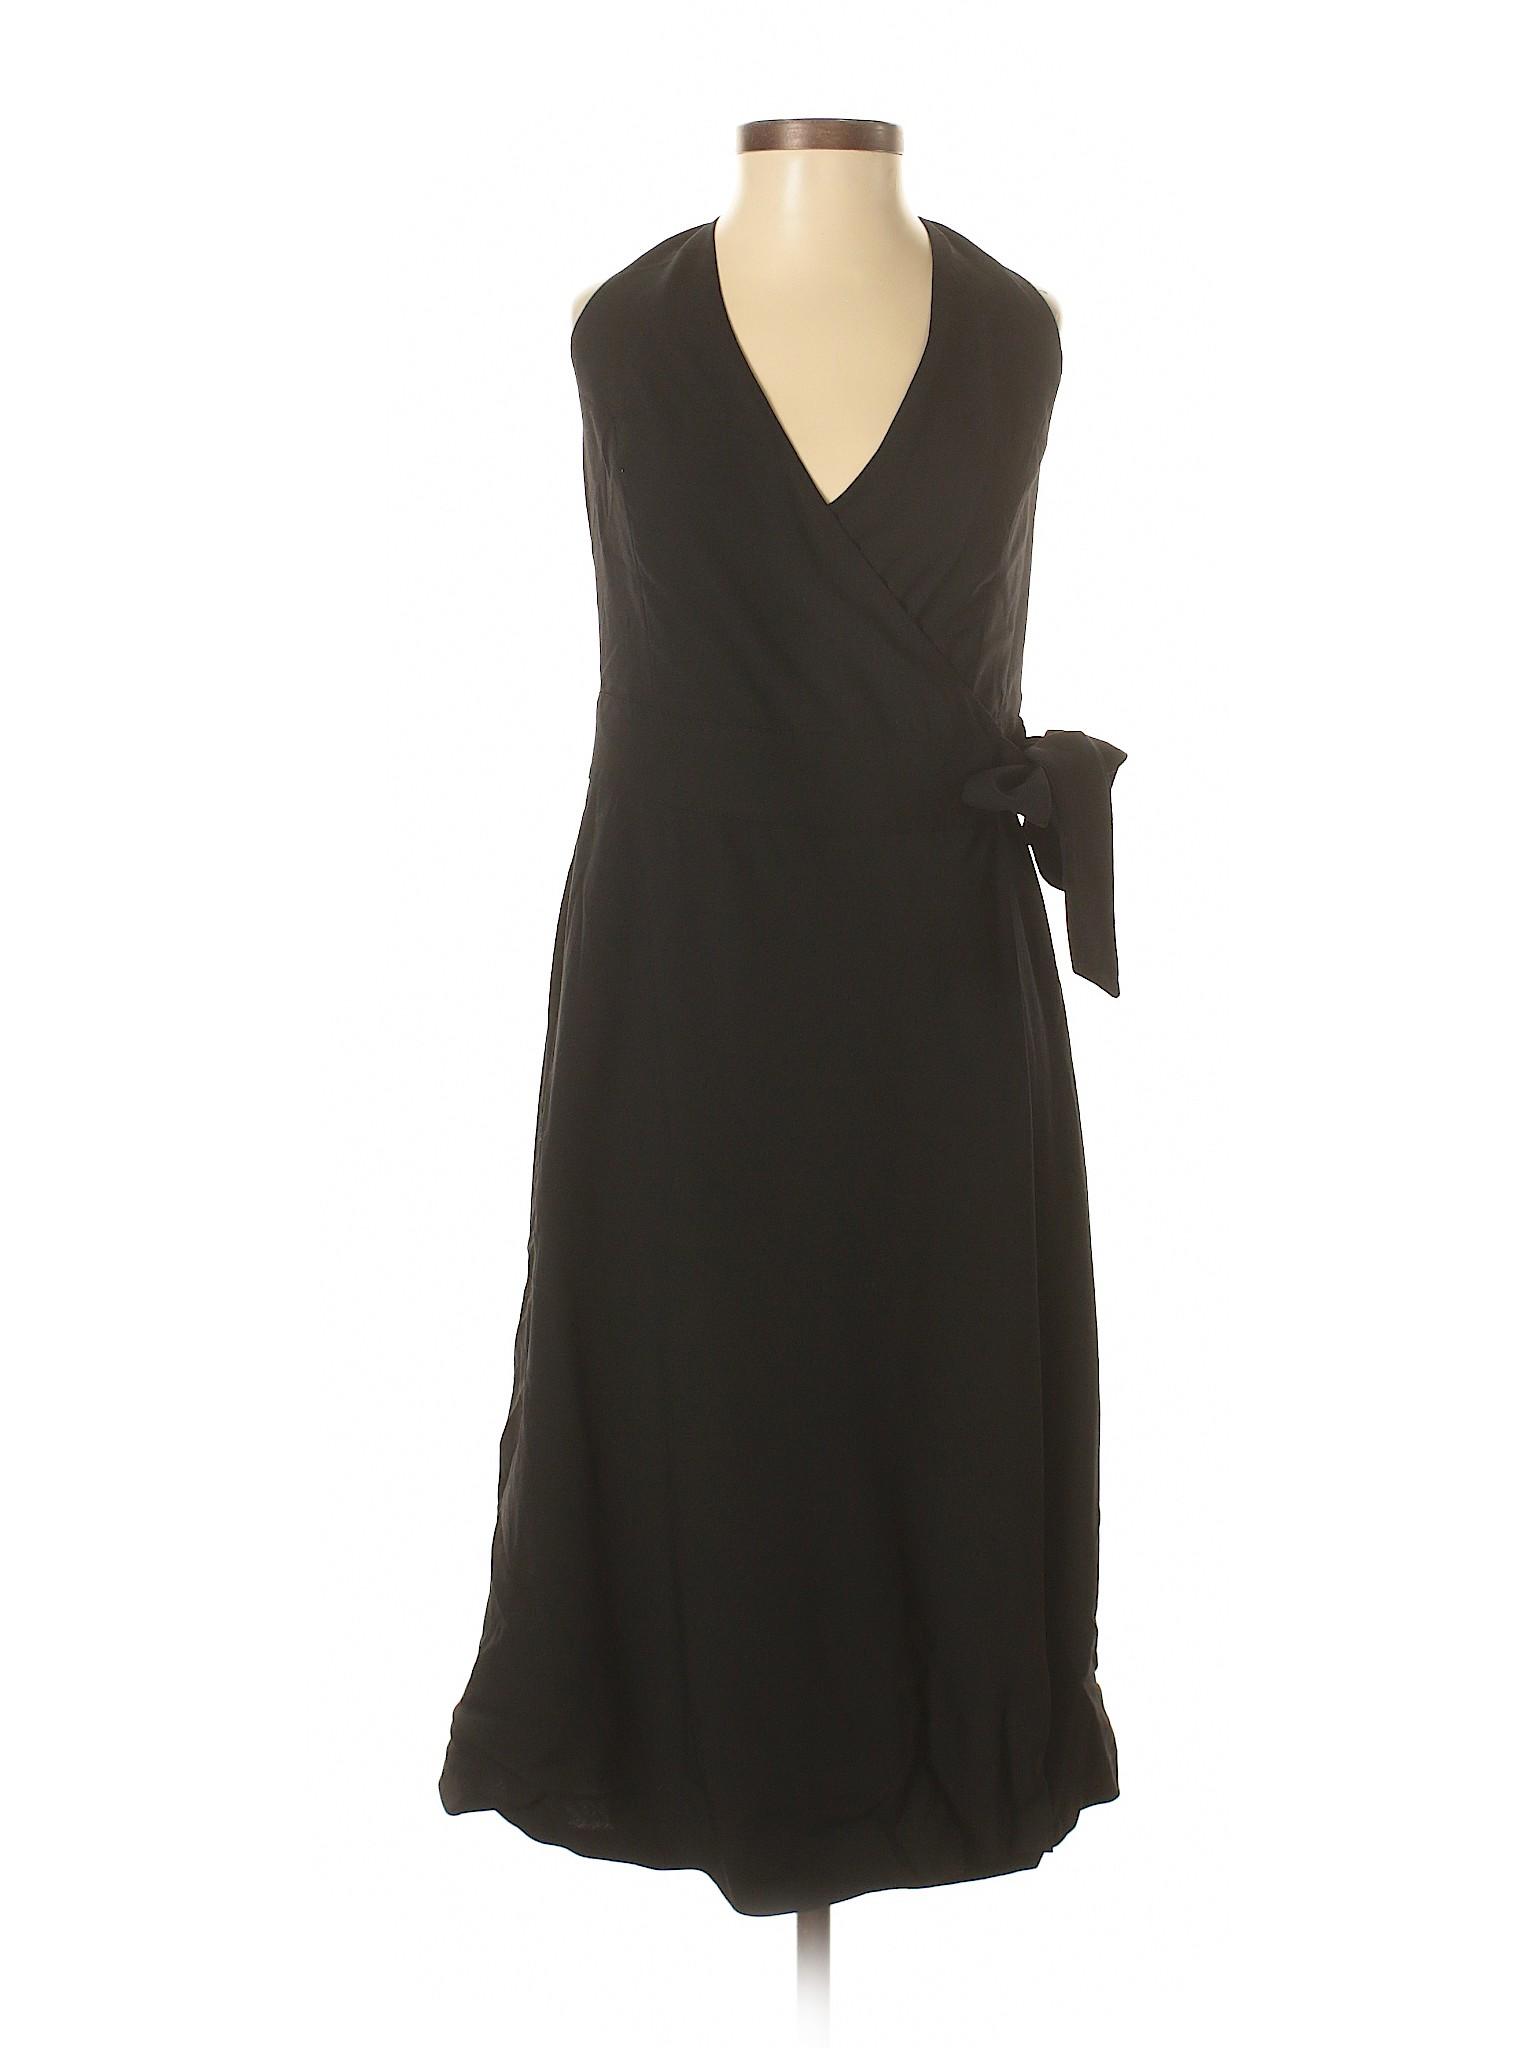 Boutique Republic Dress Banana Casual winter 8Zfrq78